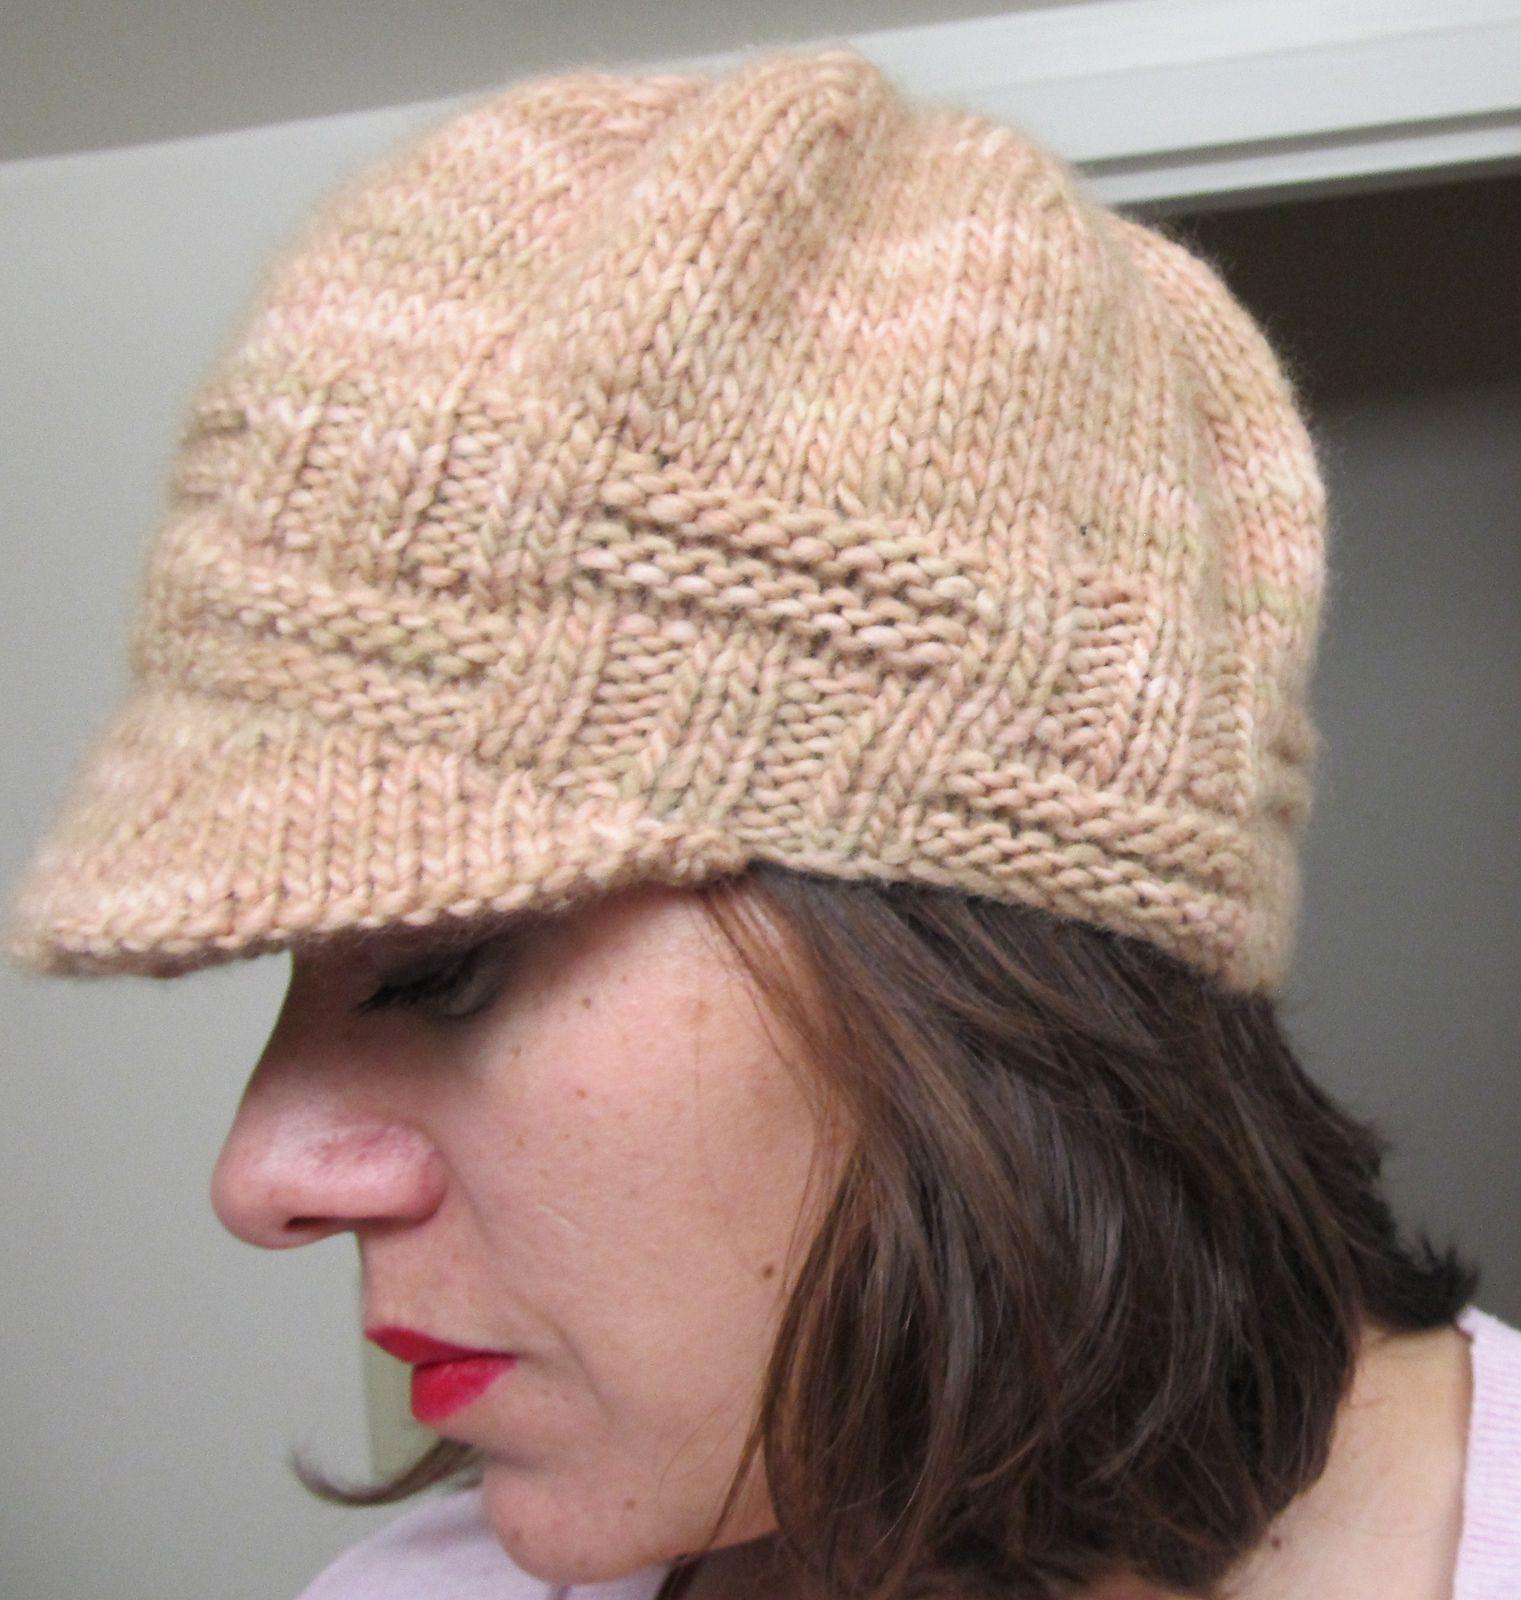 Anjas hat pattern by karina maza gildea ravelry patterns and anjas hat pattern by karina maza gildea bankloansurffo Images